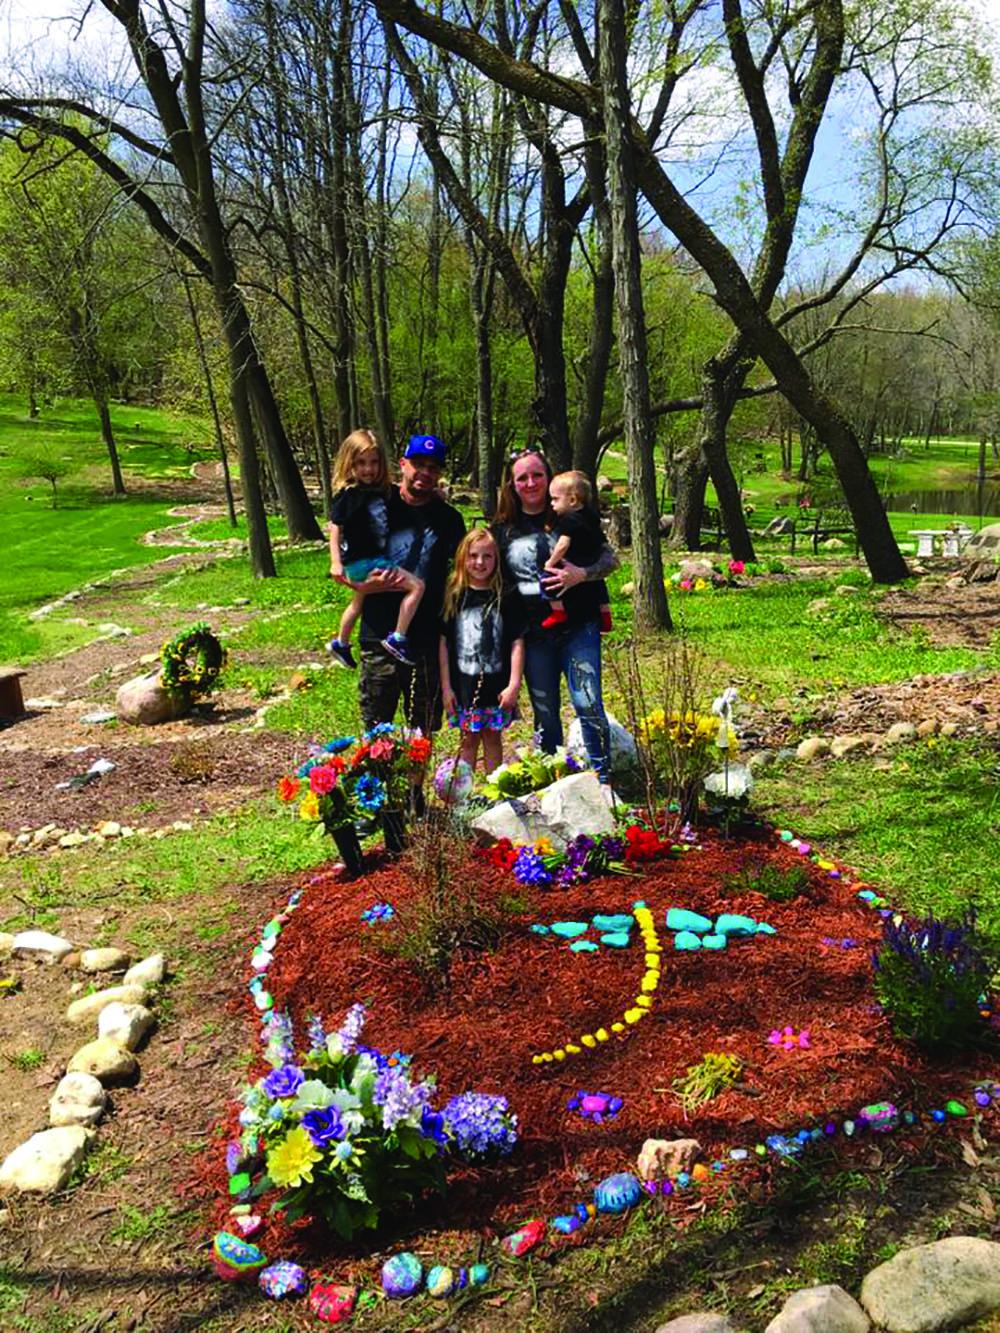 Family hopes donation stems overdoses